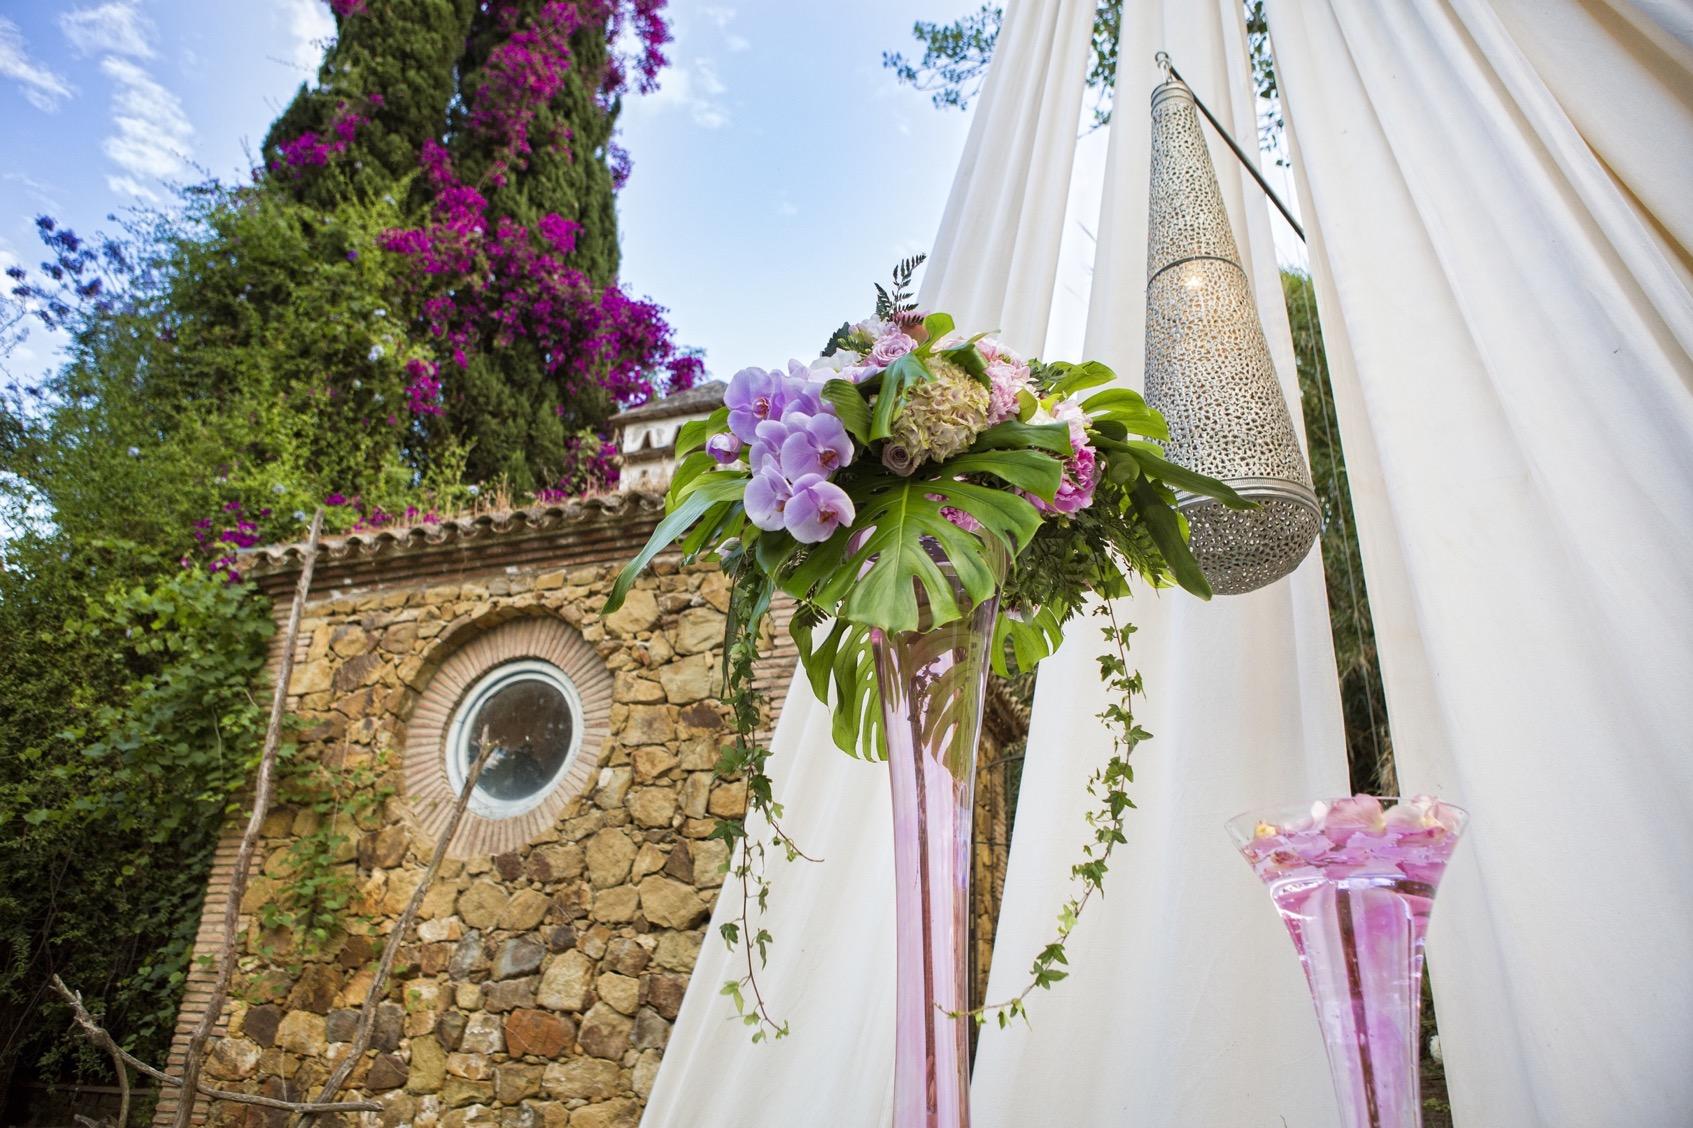 Si-Quiero-Wedding-Planner-By-Sira-Antequera-Bodas-Málaga-Marbella-Miami- -6